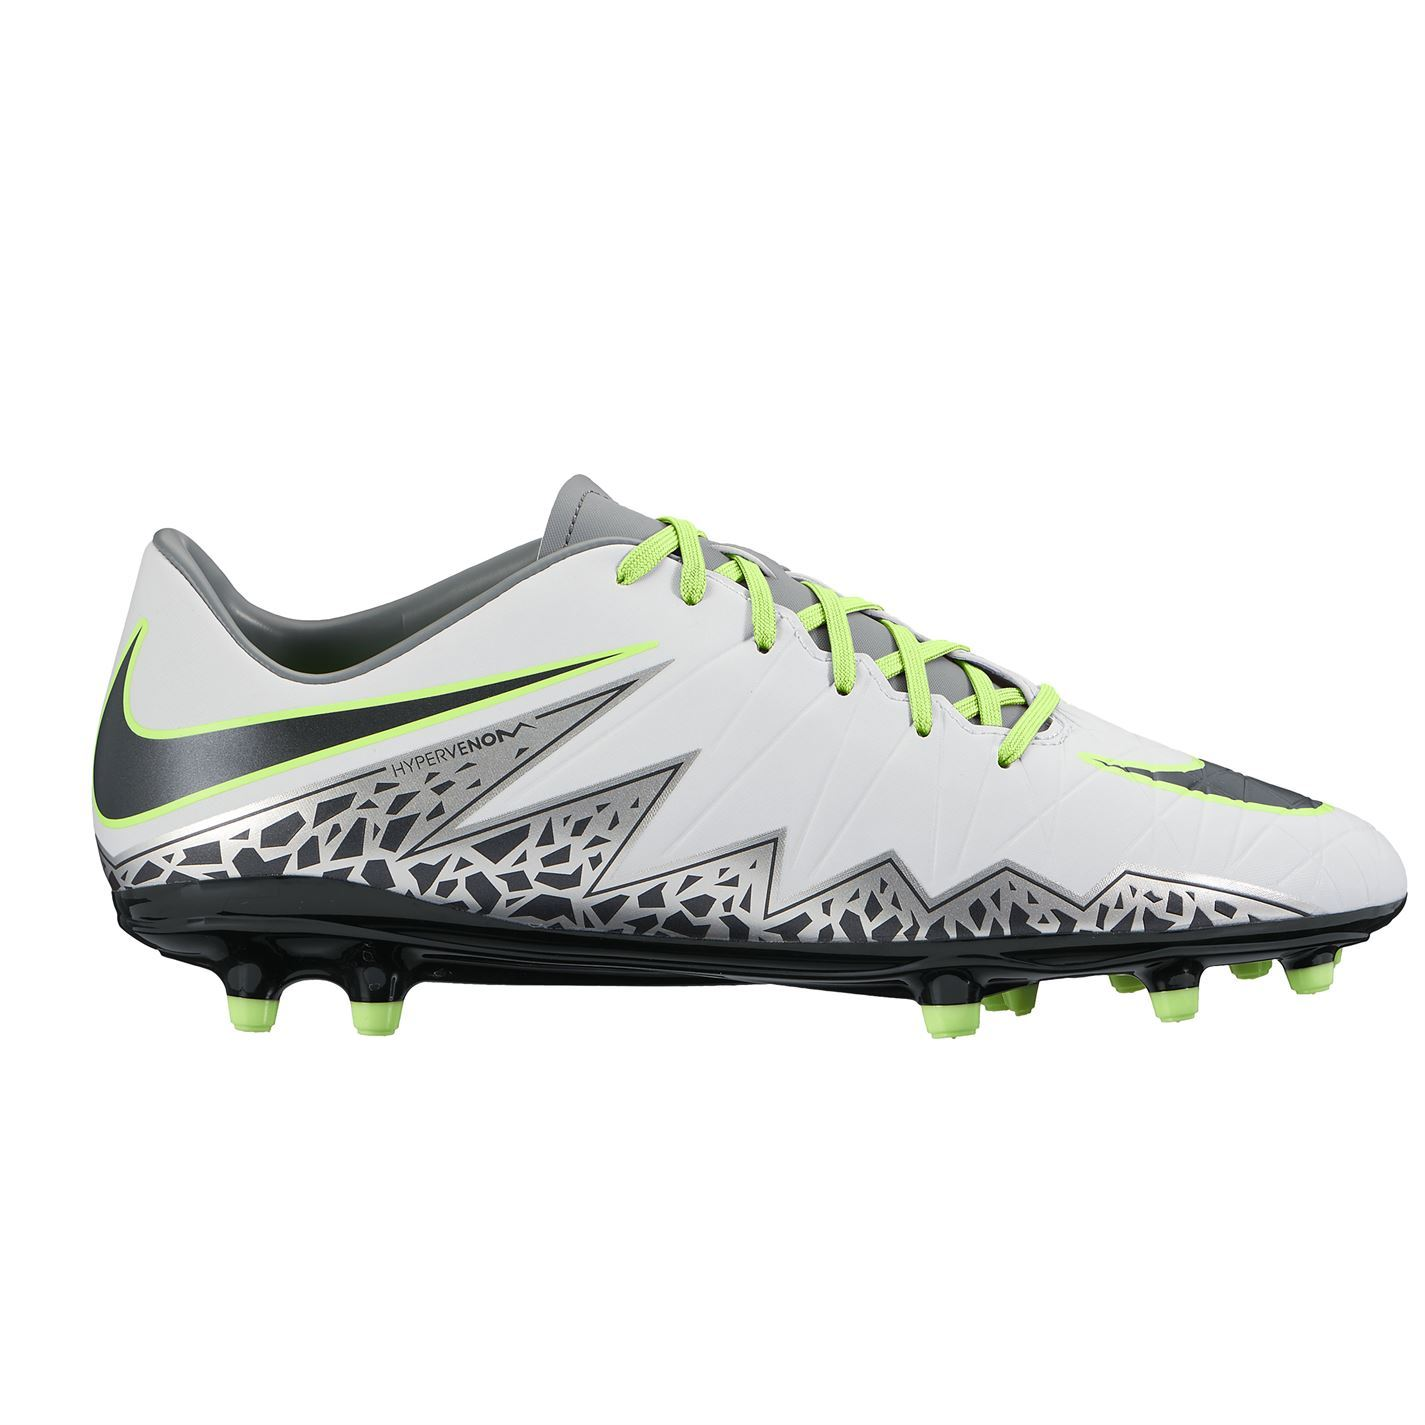 ... Nike Hypervenom Phelon FG Firm Ground Football Boots Mens Plat/Blk Soccer  Shoes